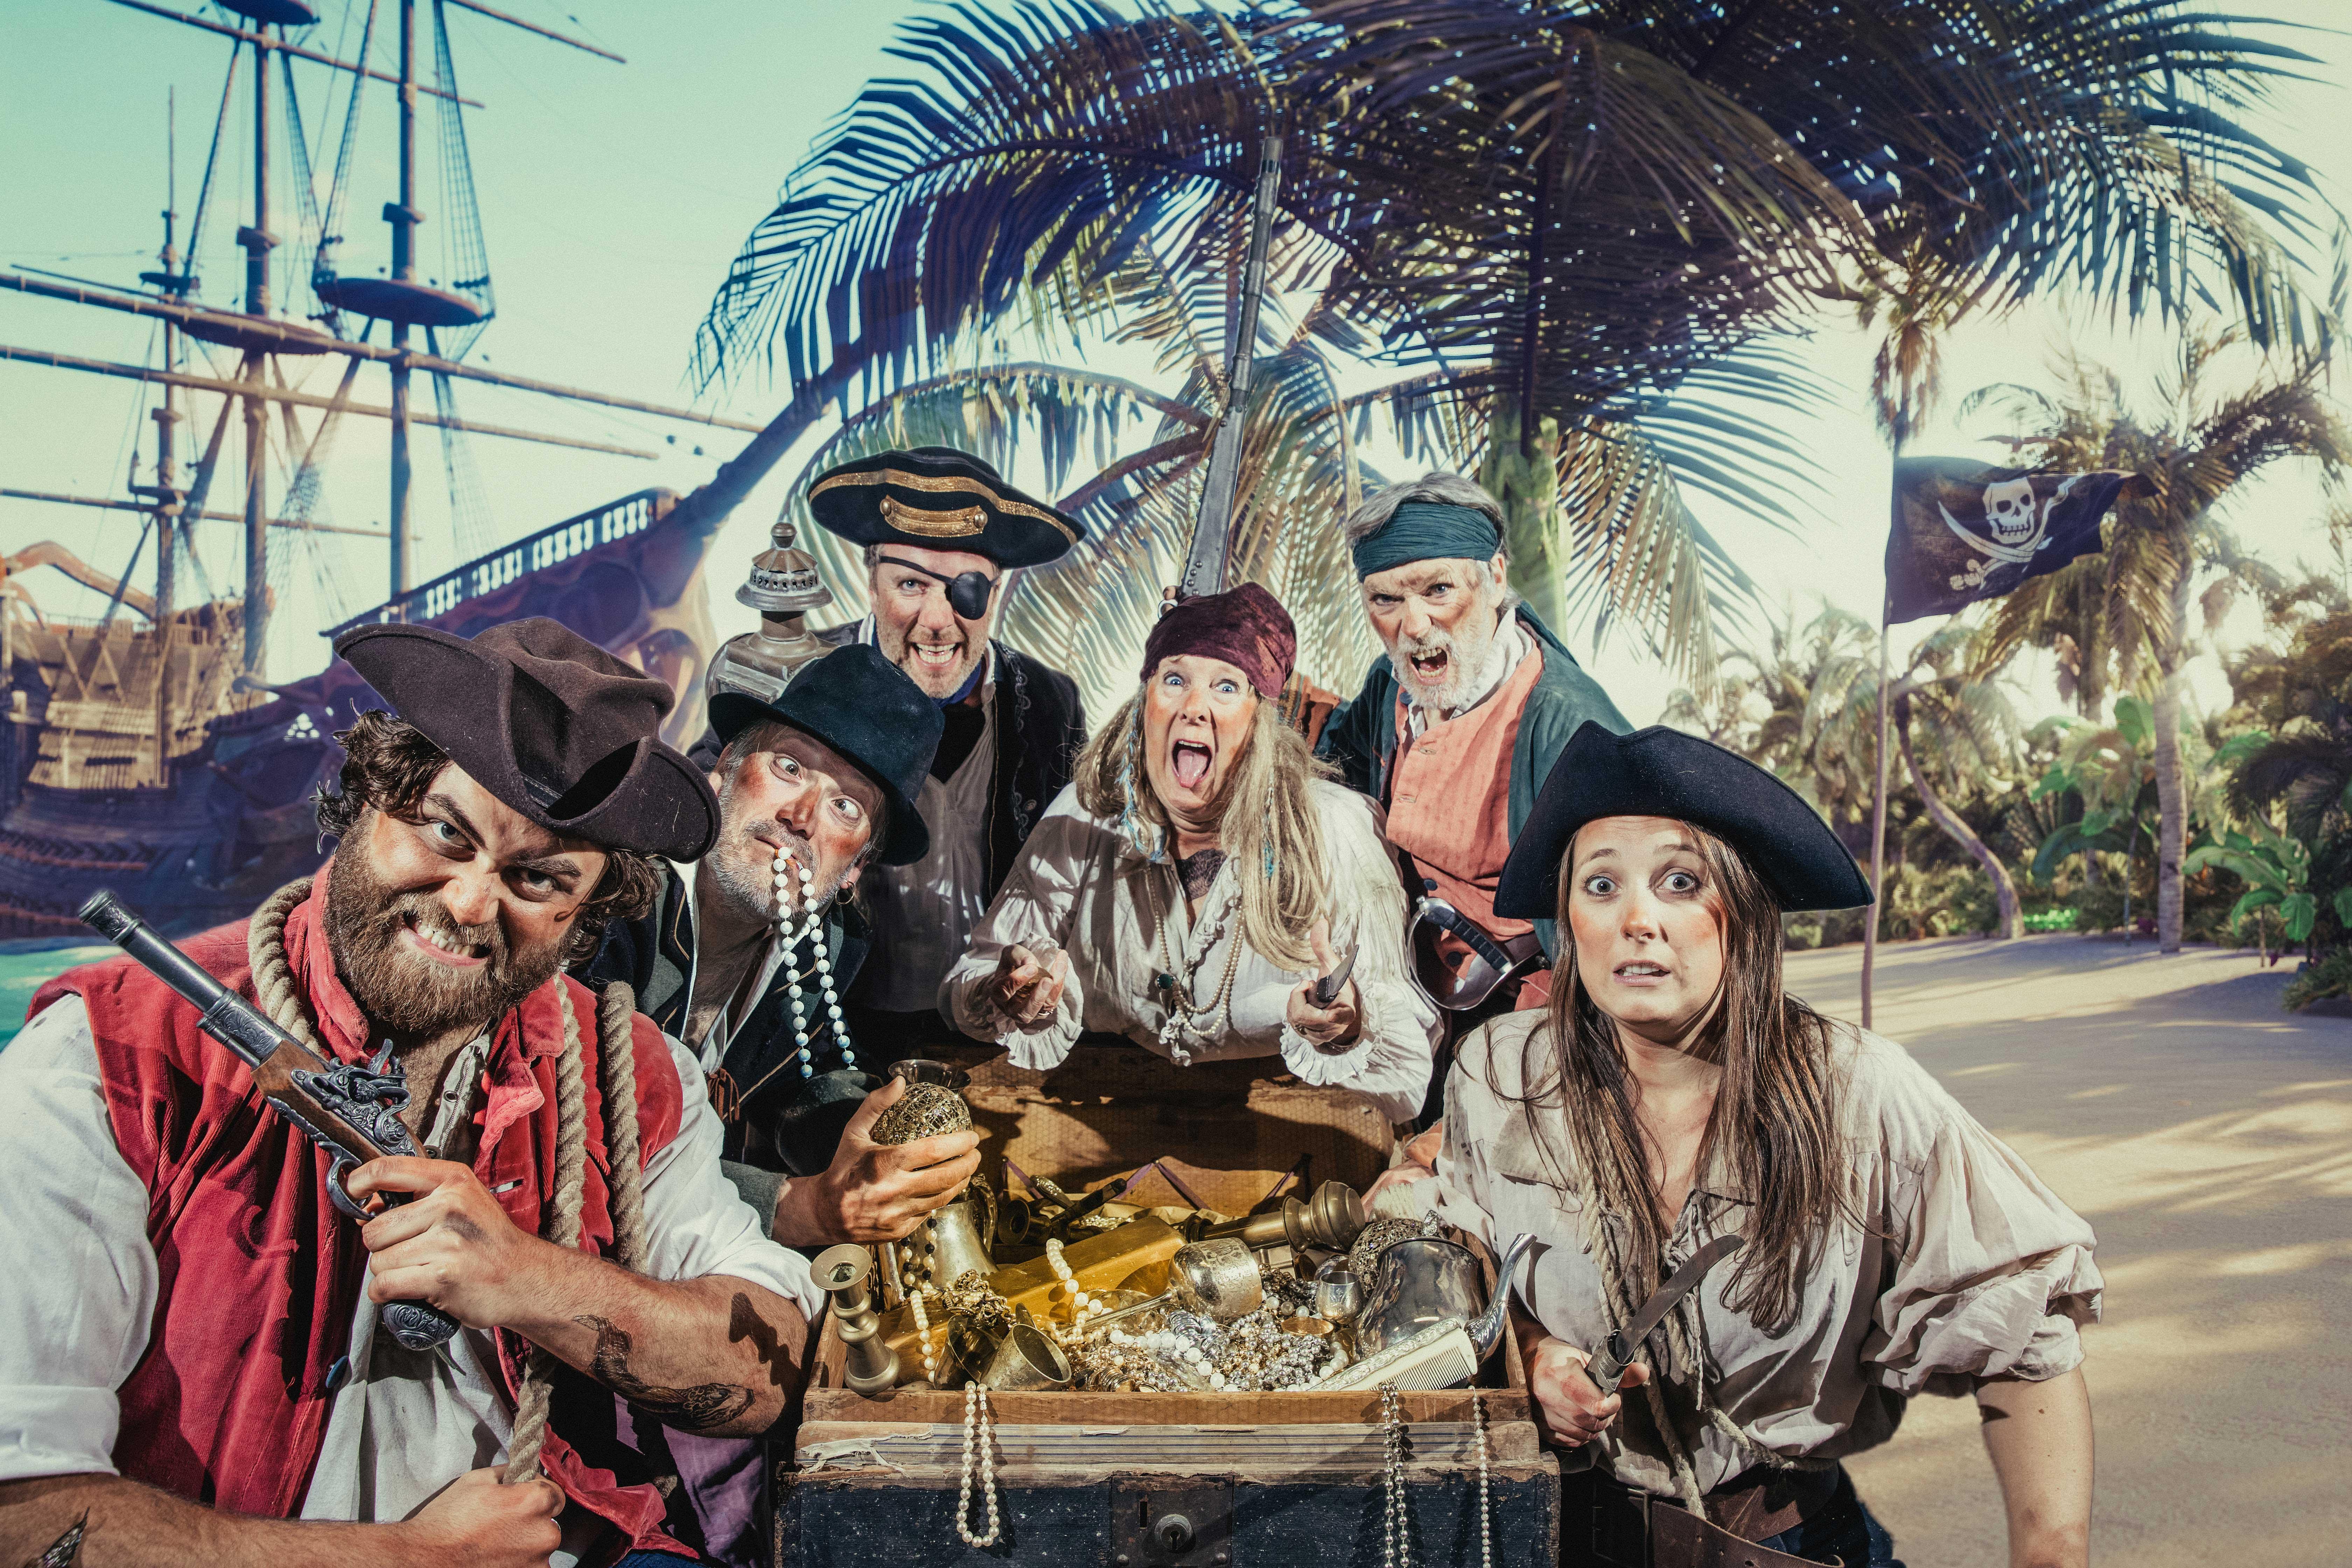 Treasure Island Full Crew Photo by Kirstin Prisk